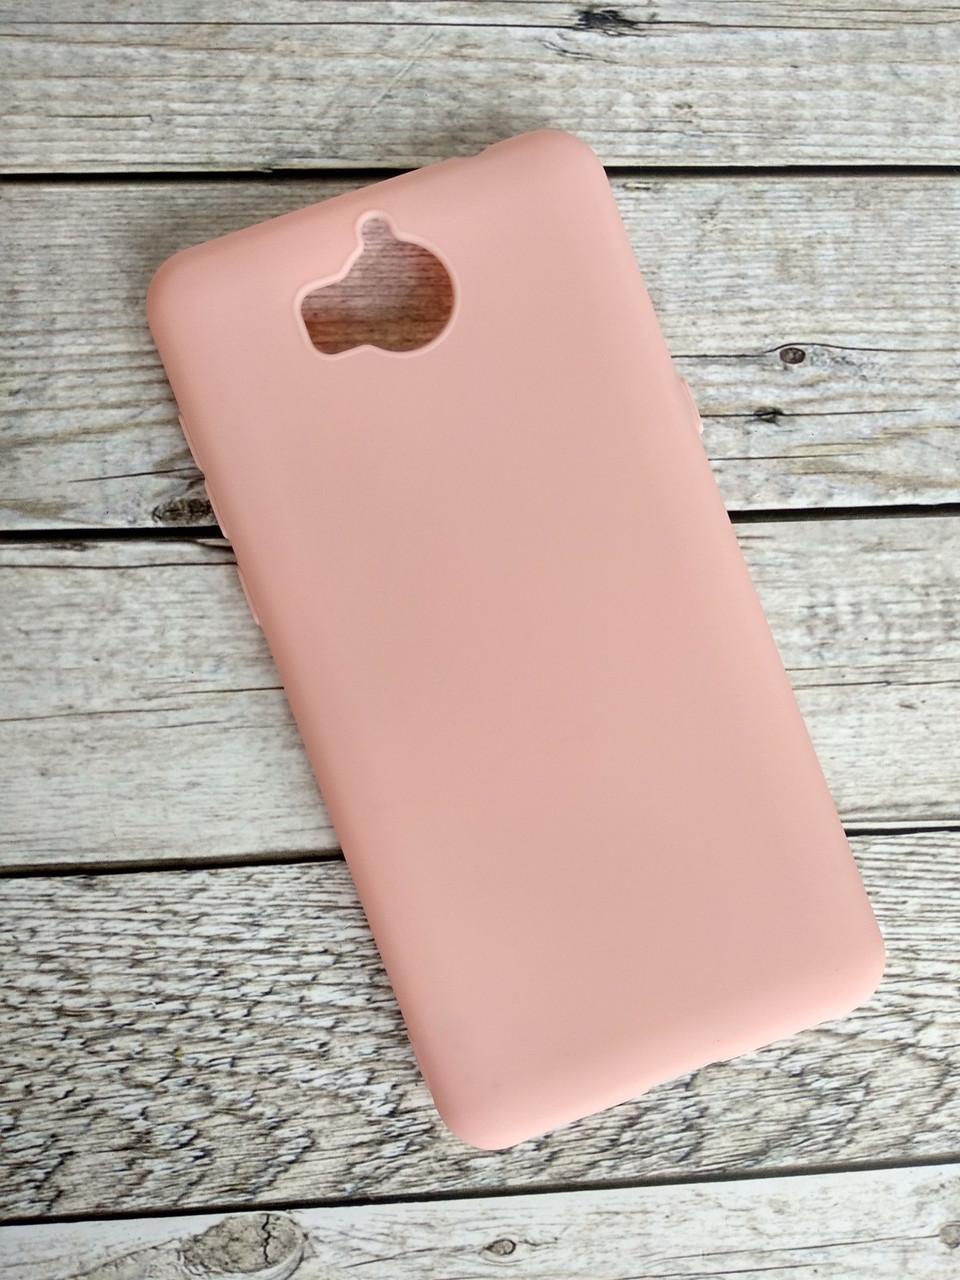 Чехол Huawei Y5 (2018) Silicon TPU Soft Case Pink